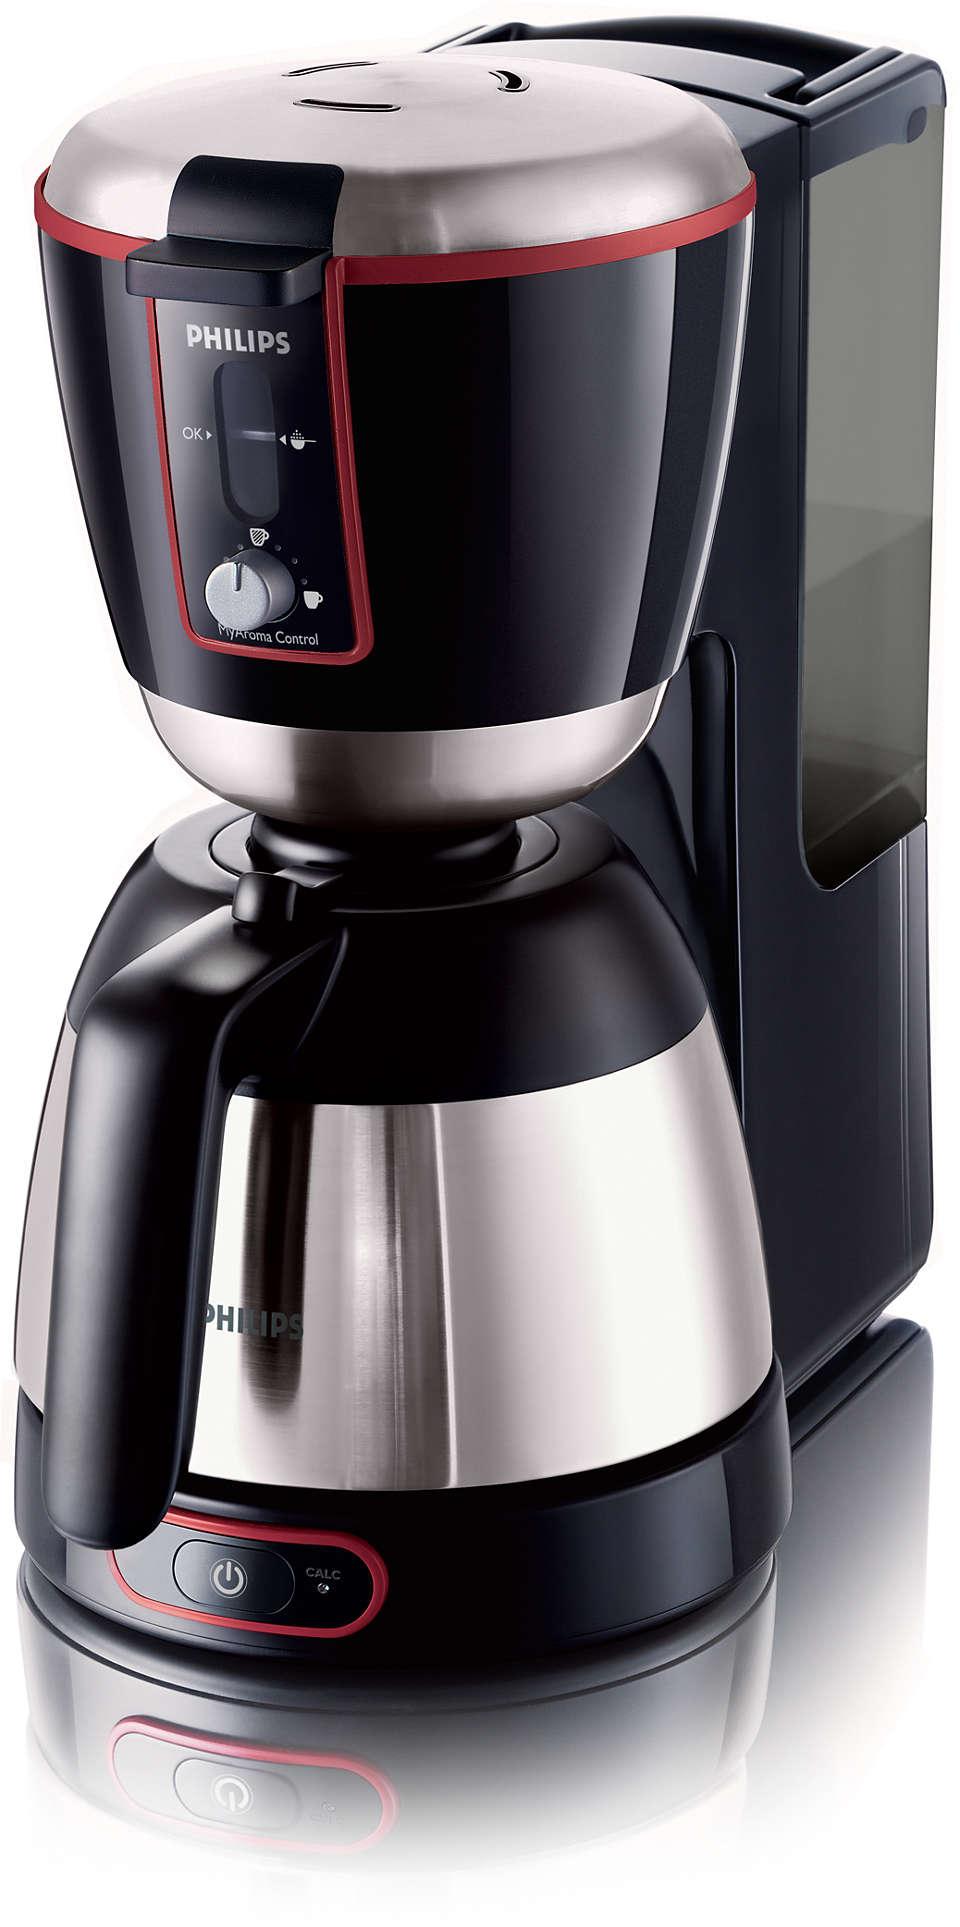 Have a perfect espresso just pressing a button